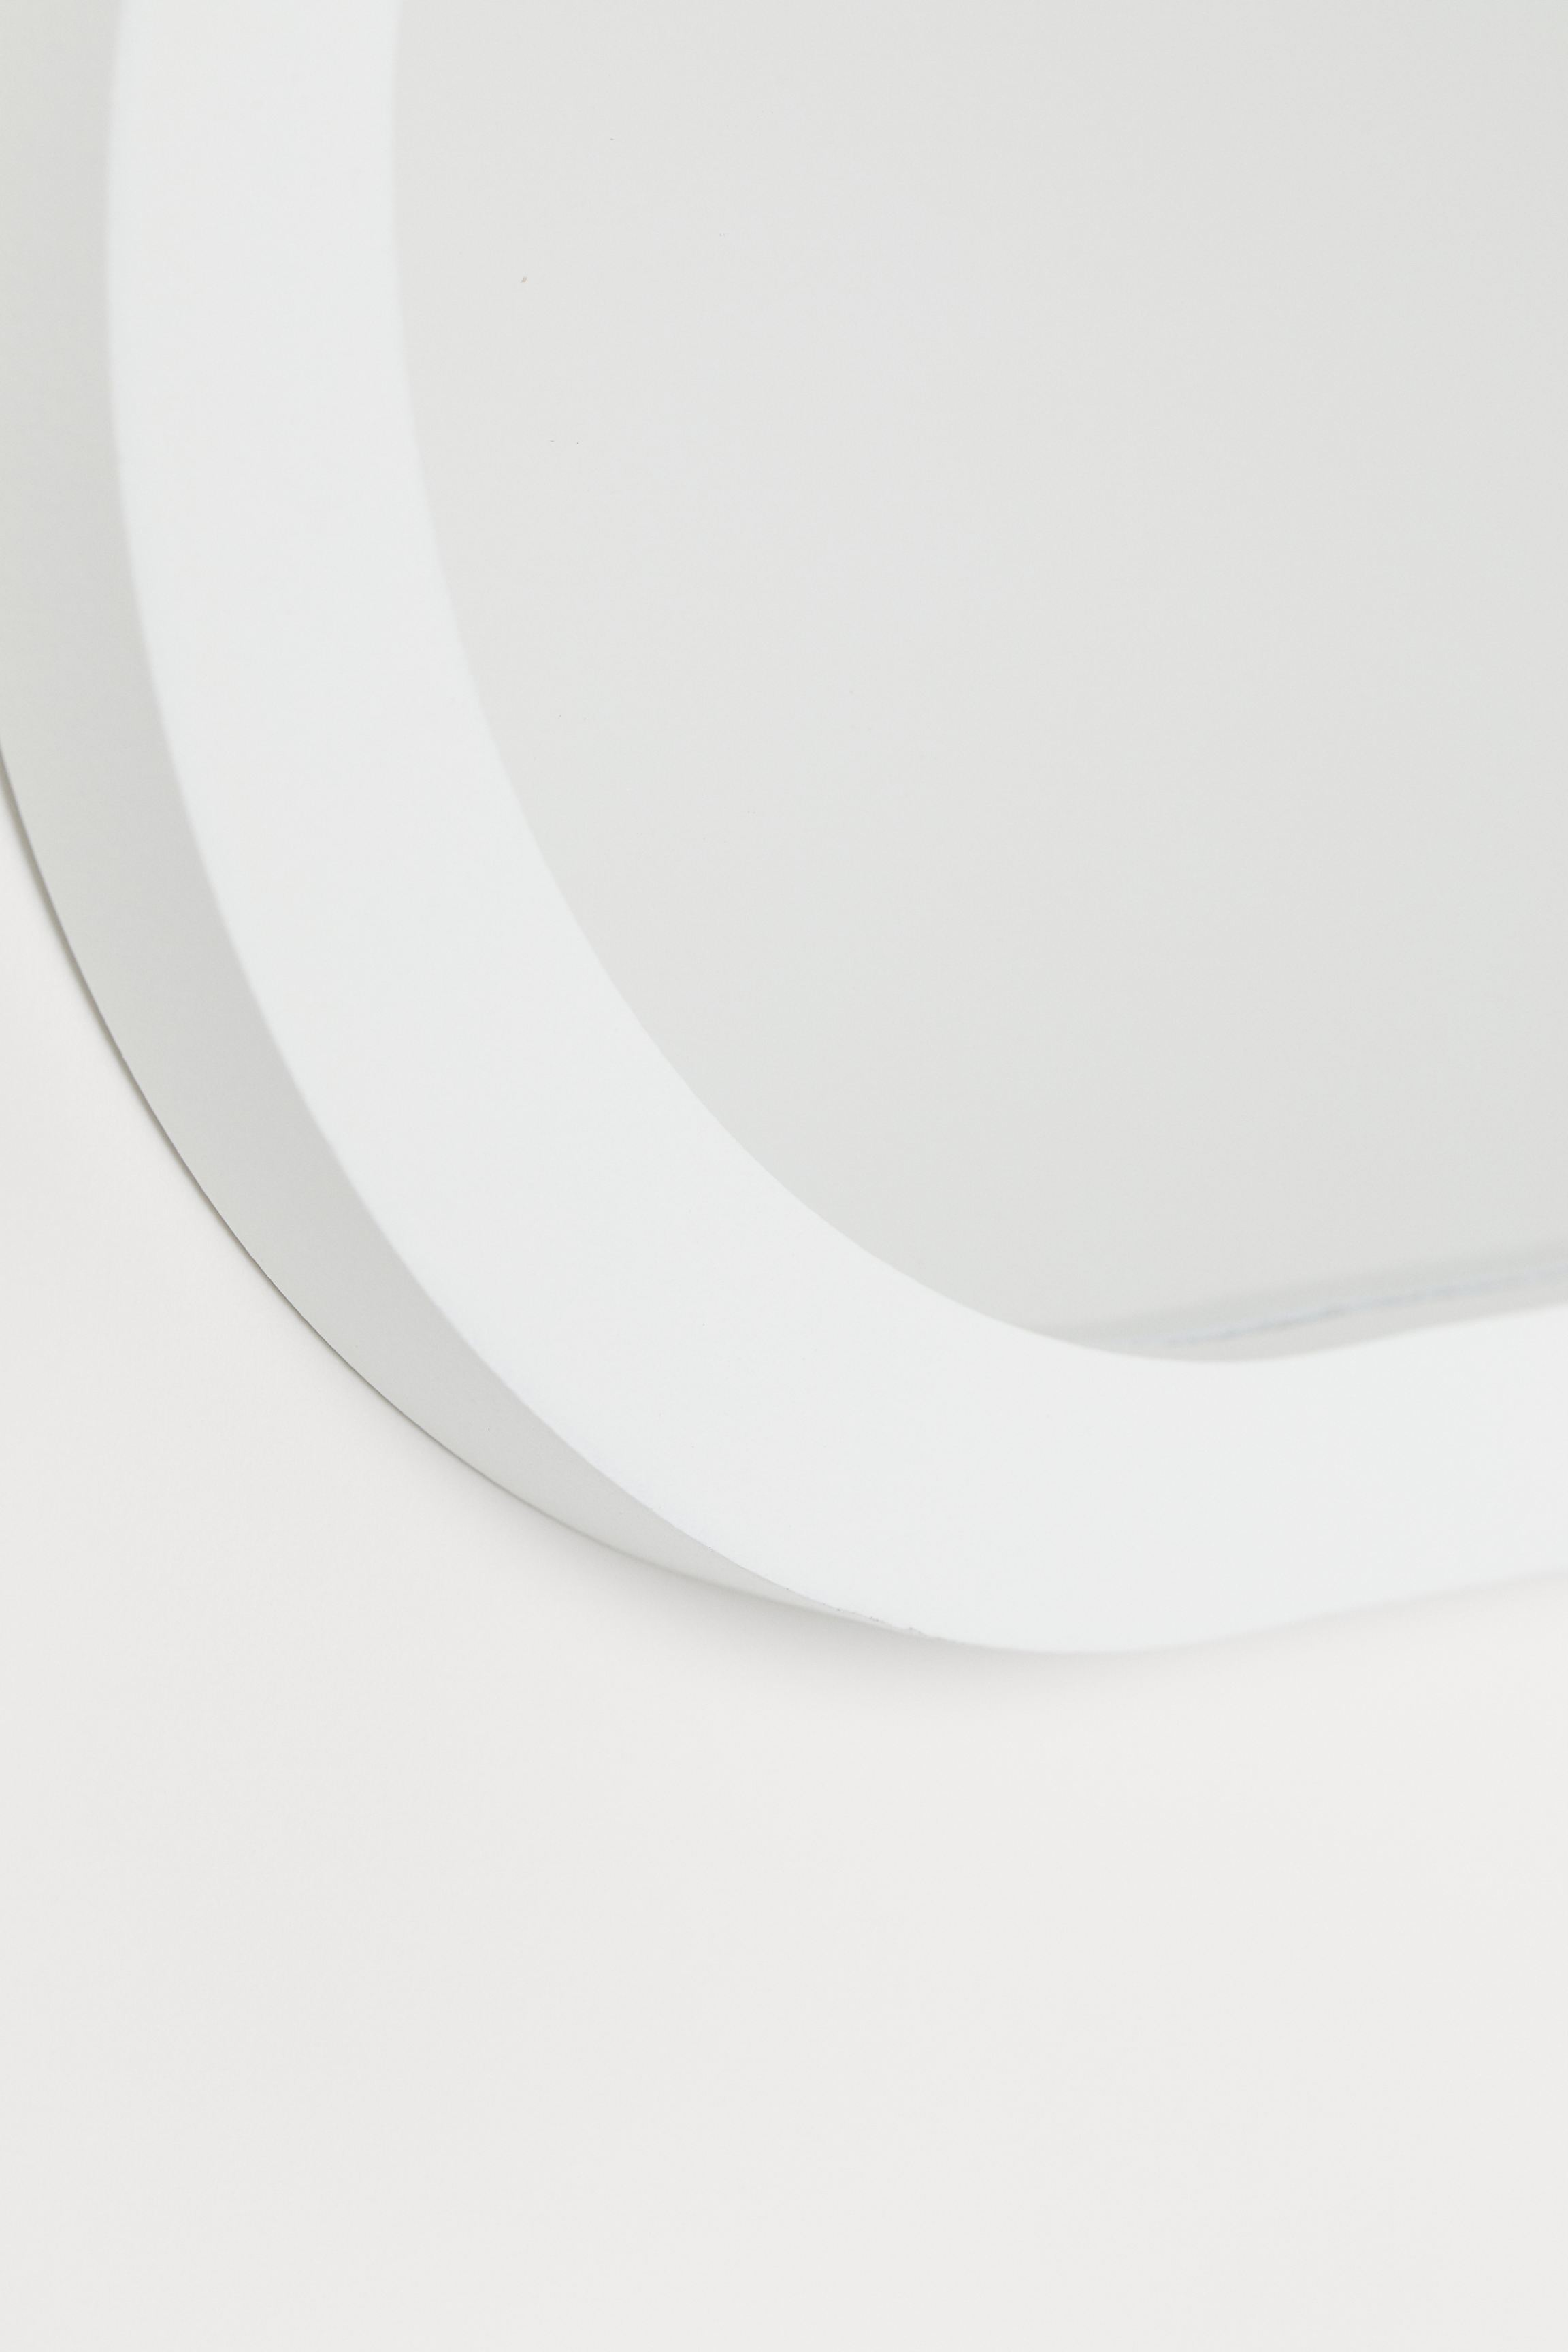 Cloud-shaped Mirror